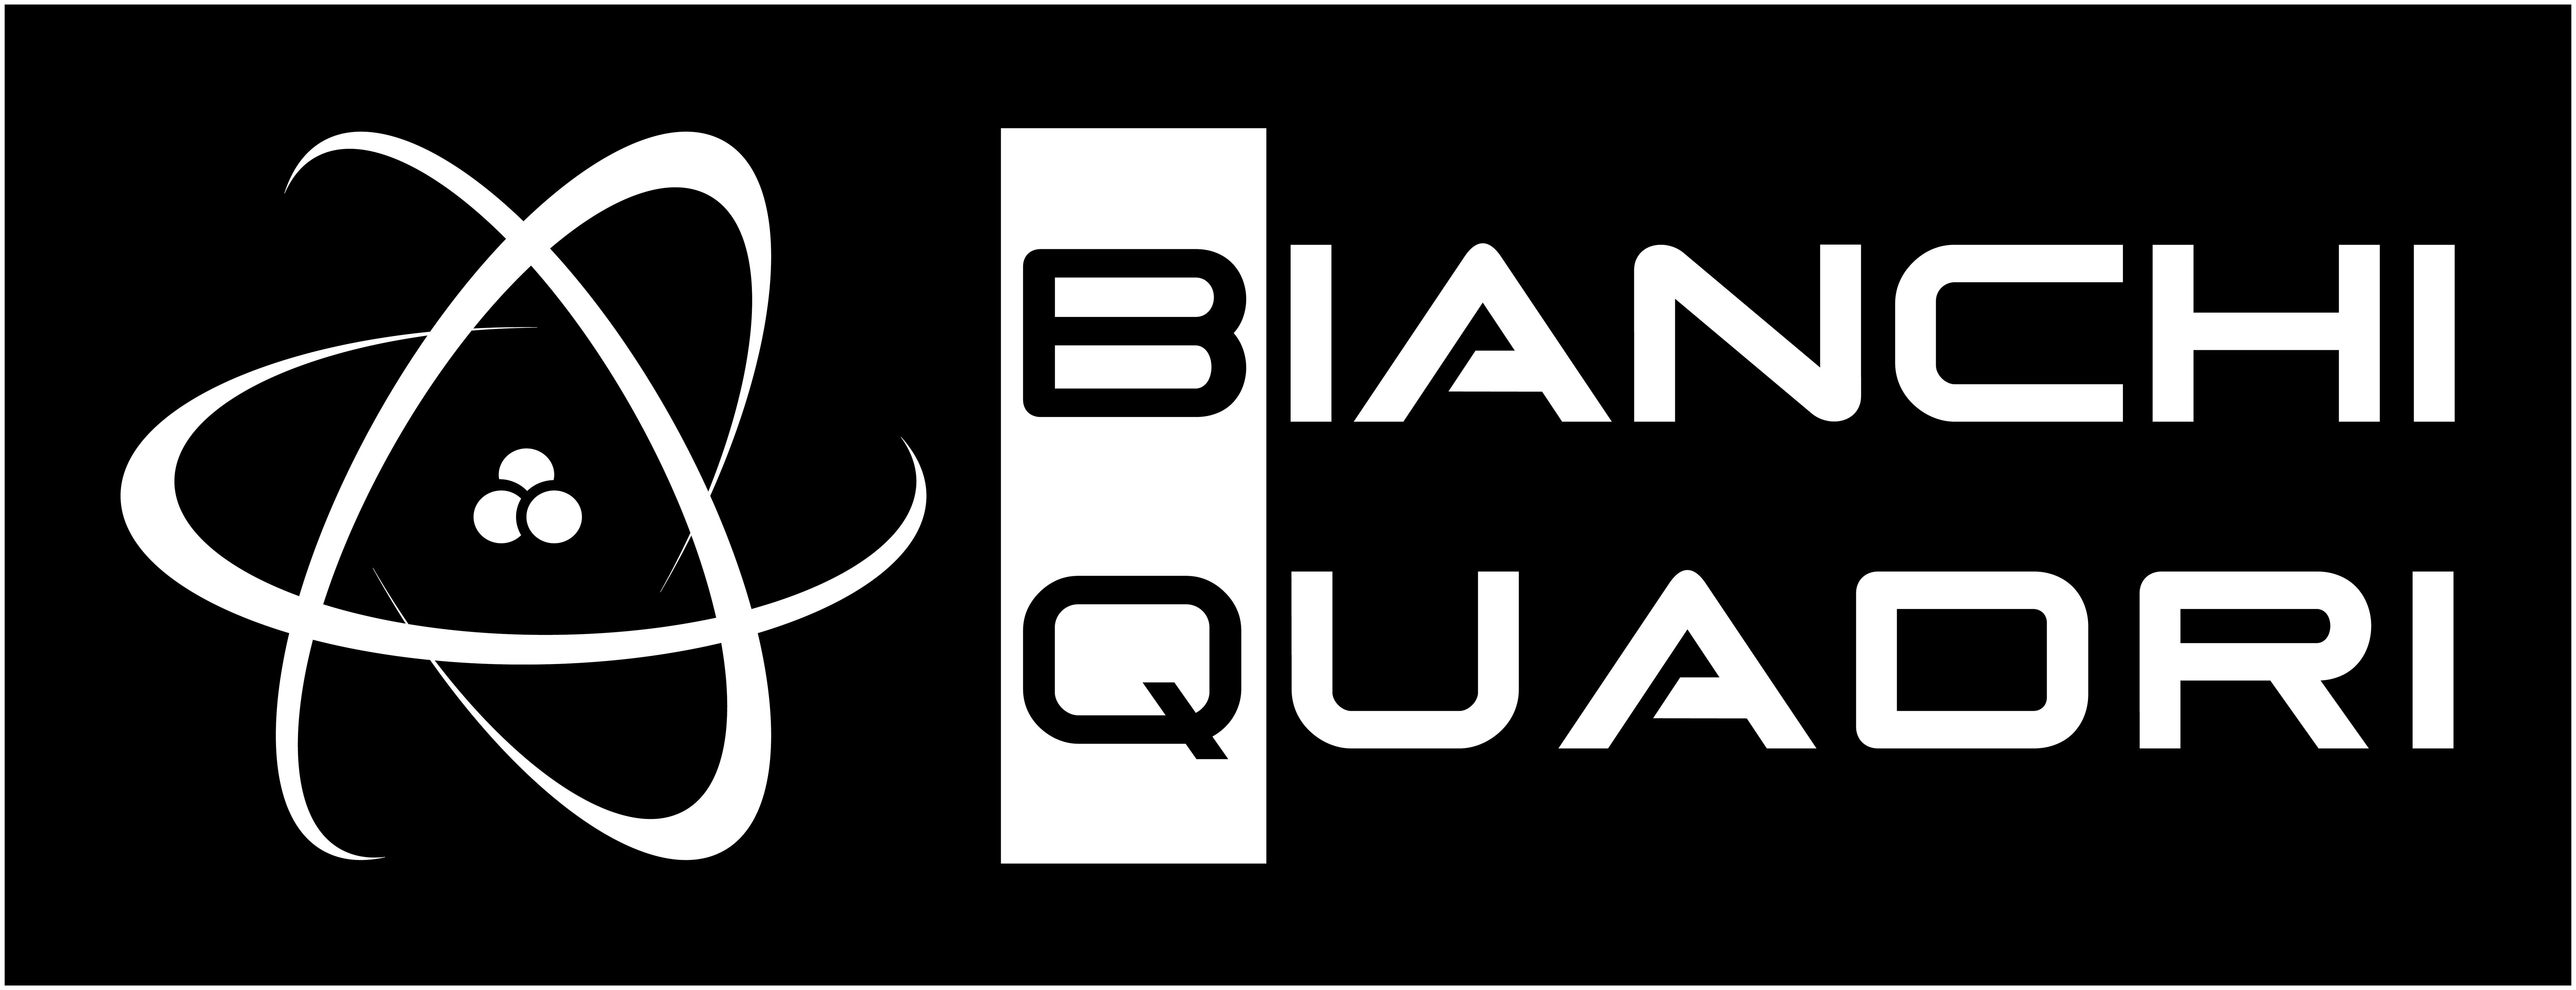 Bianchi Quadri